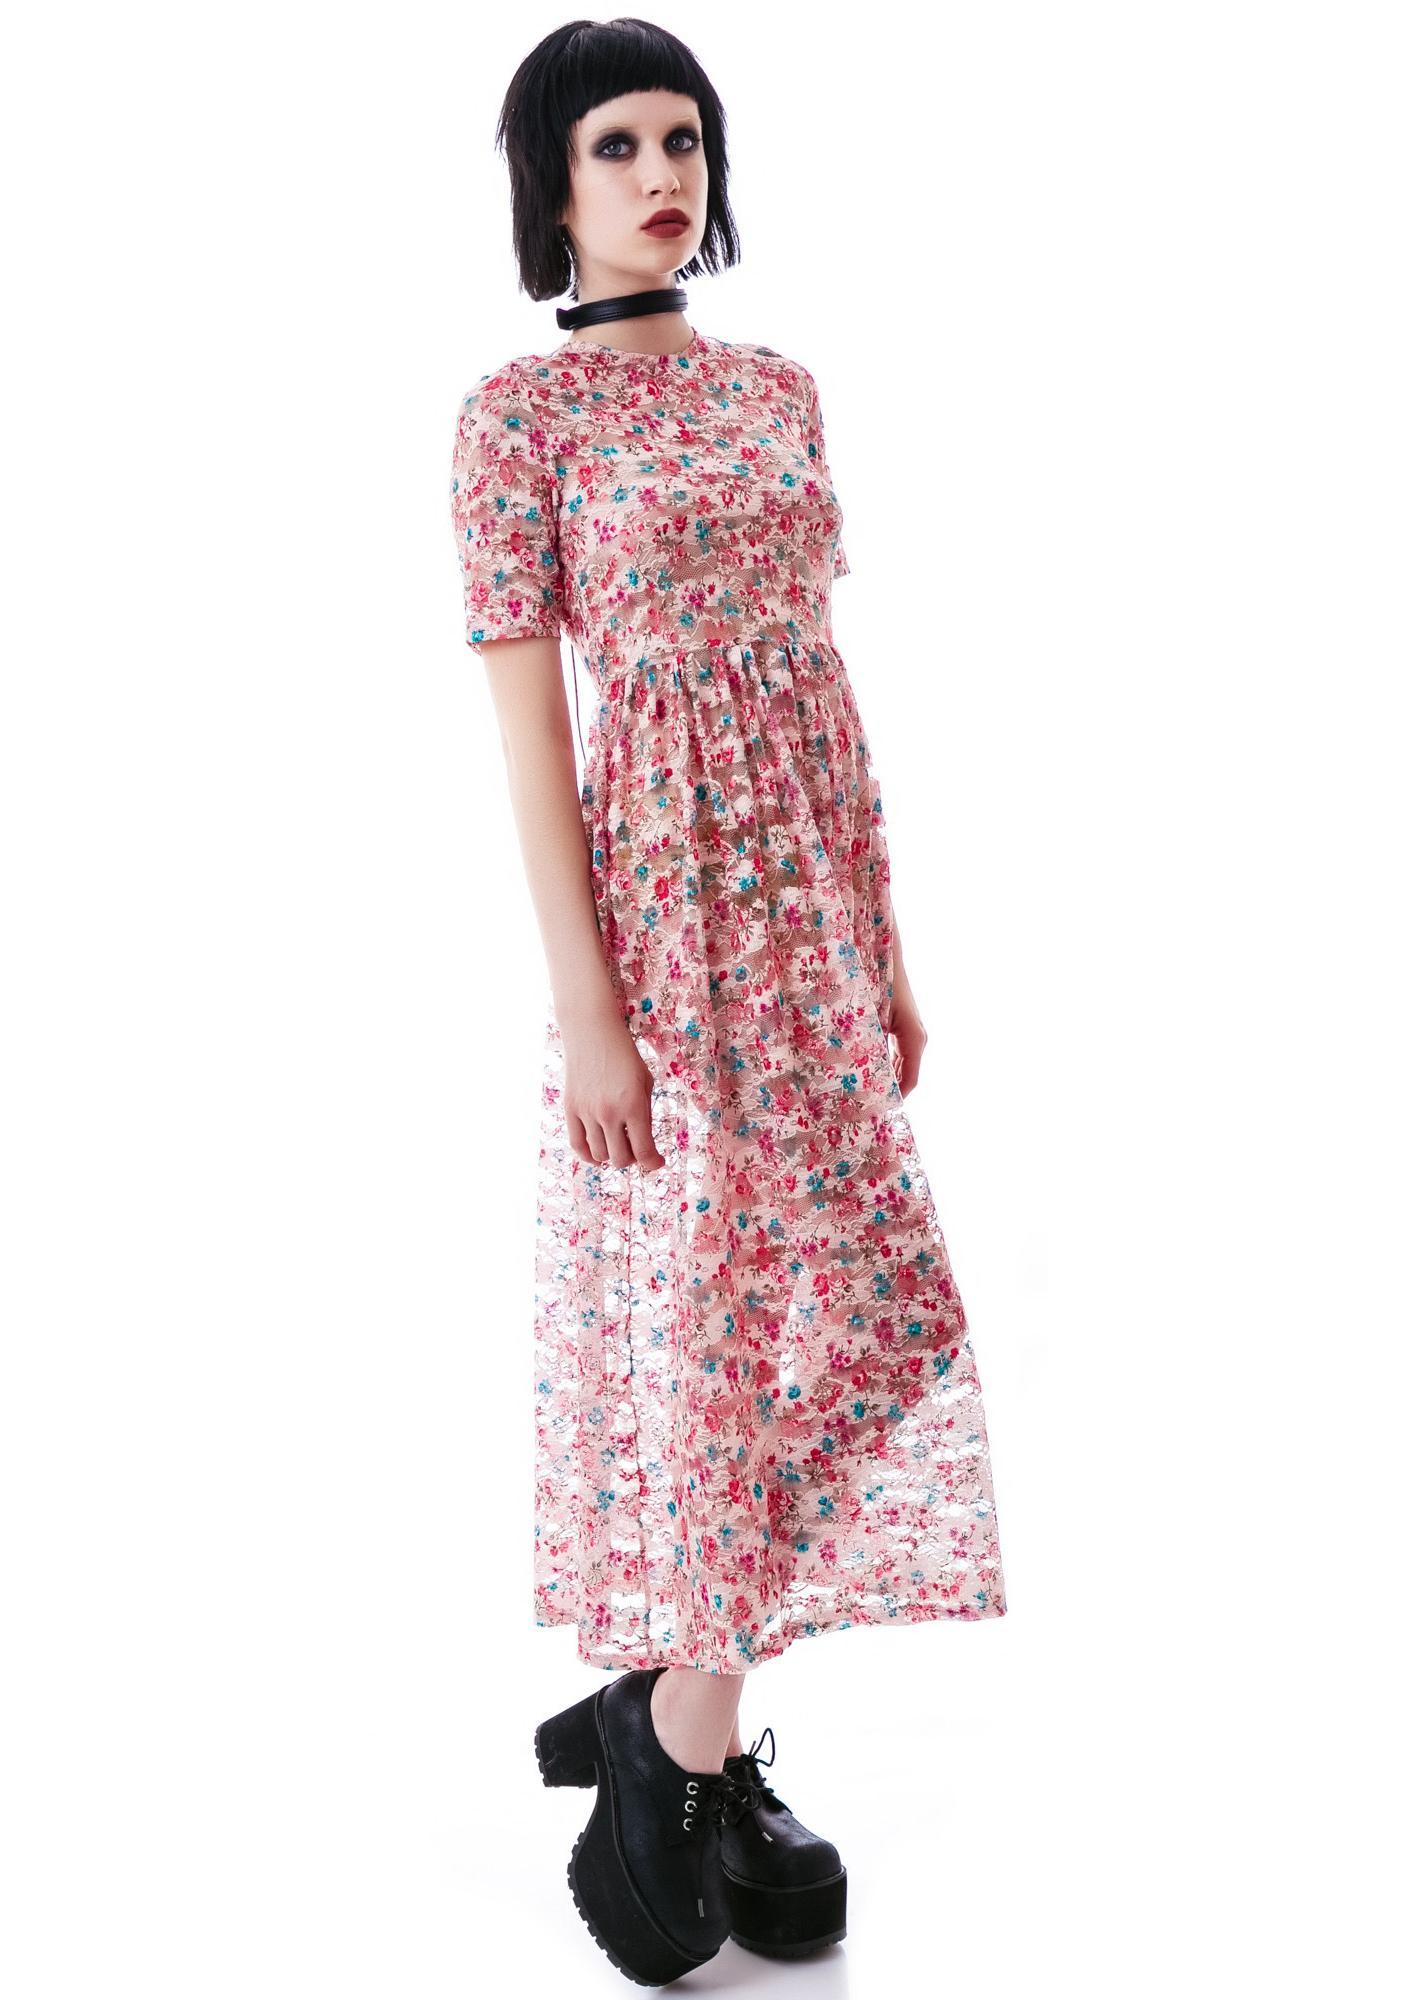 Laura Ashley Lace Up Maxi Dress